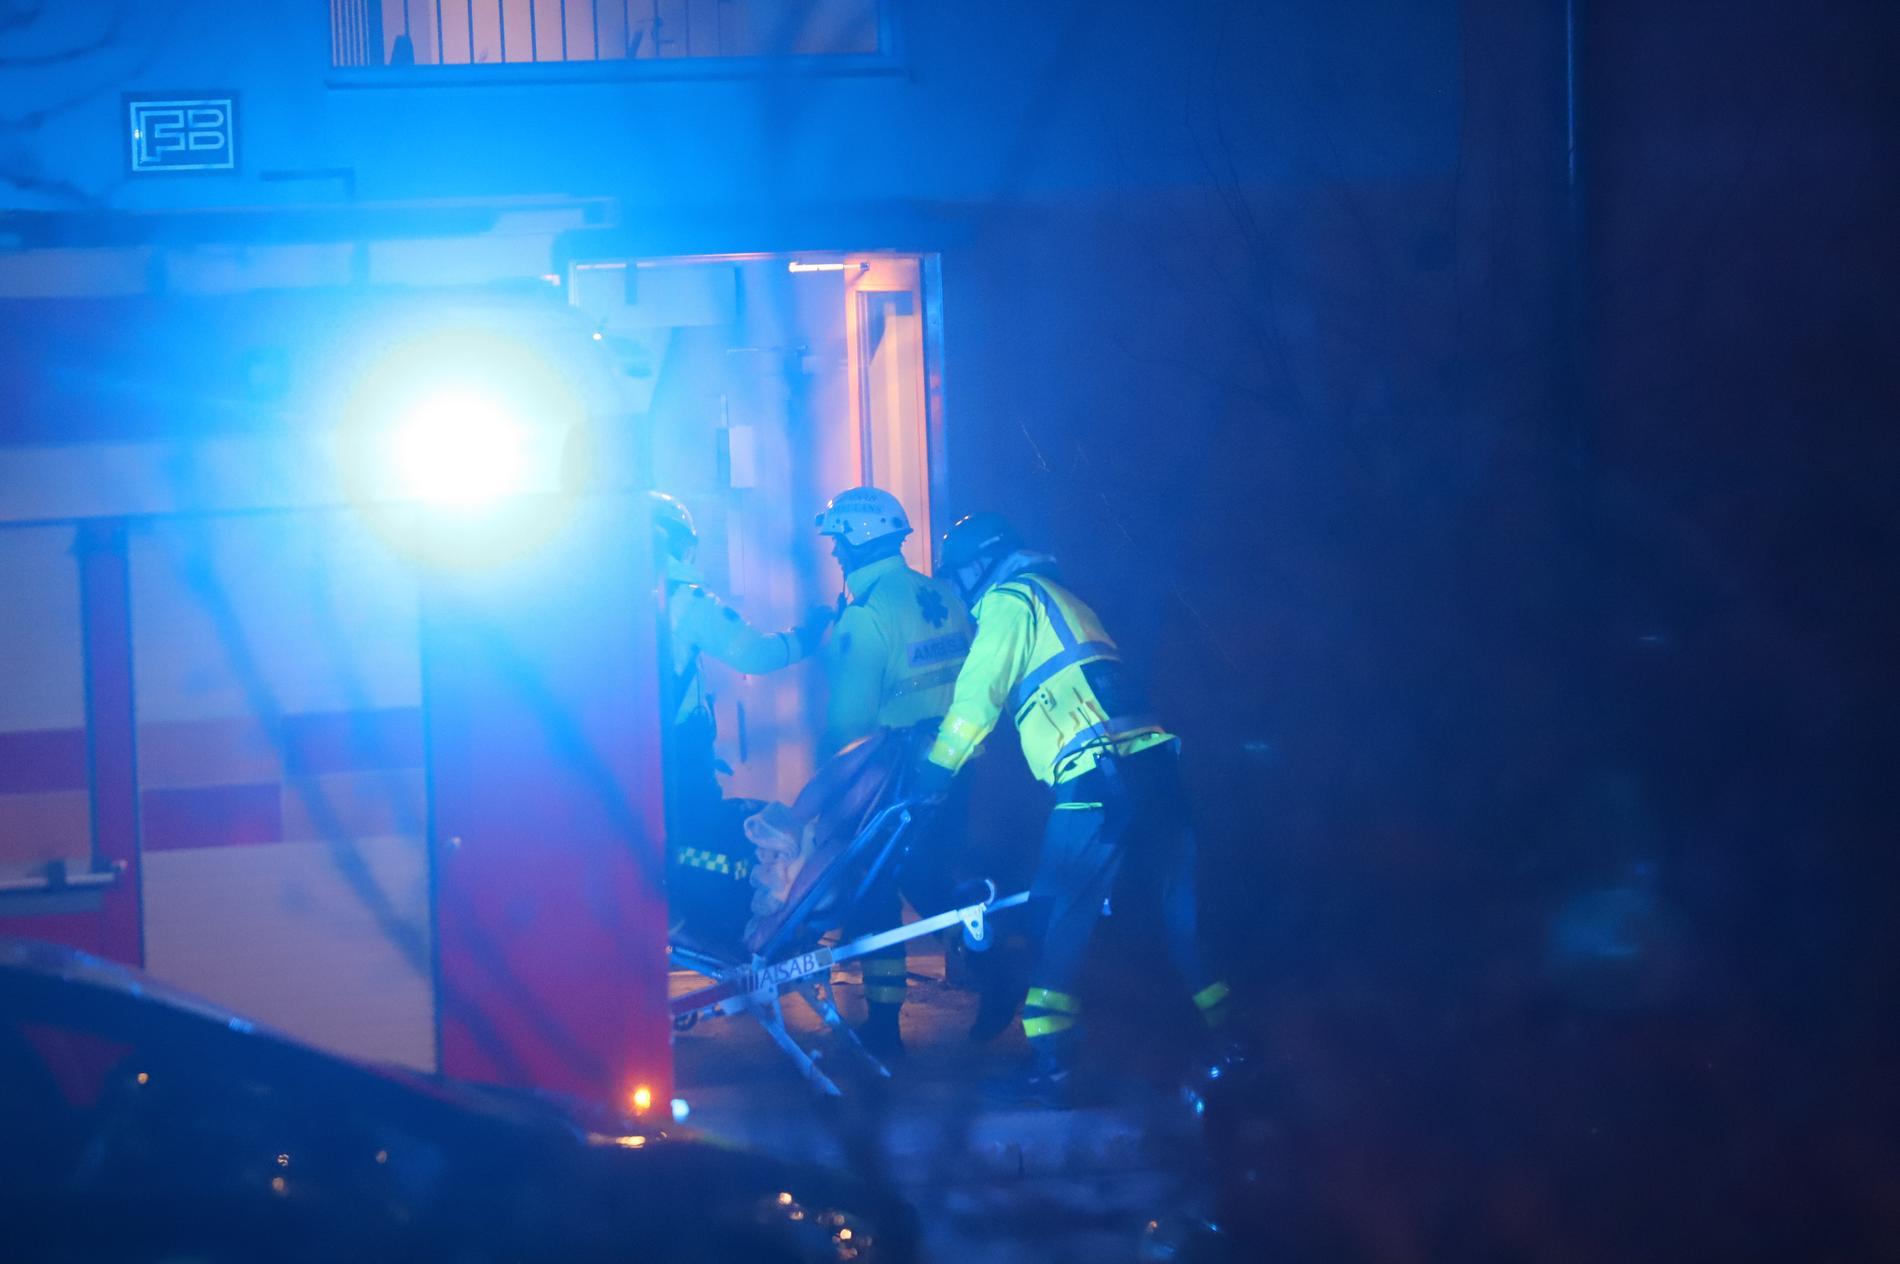 Natten mot fredag skedde en explosion vid ett flerfamiljshus i Farsta.